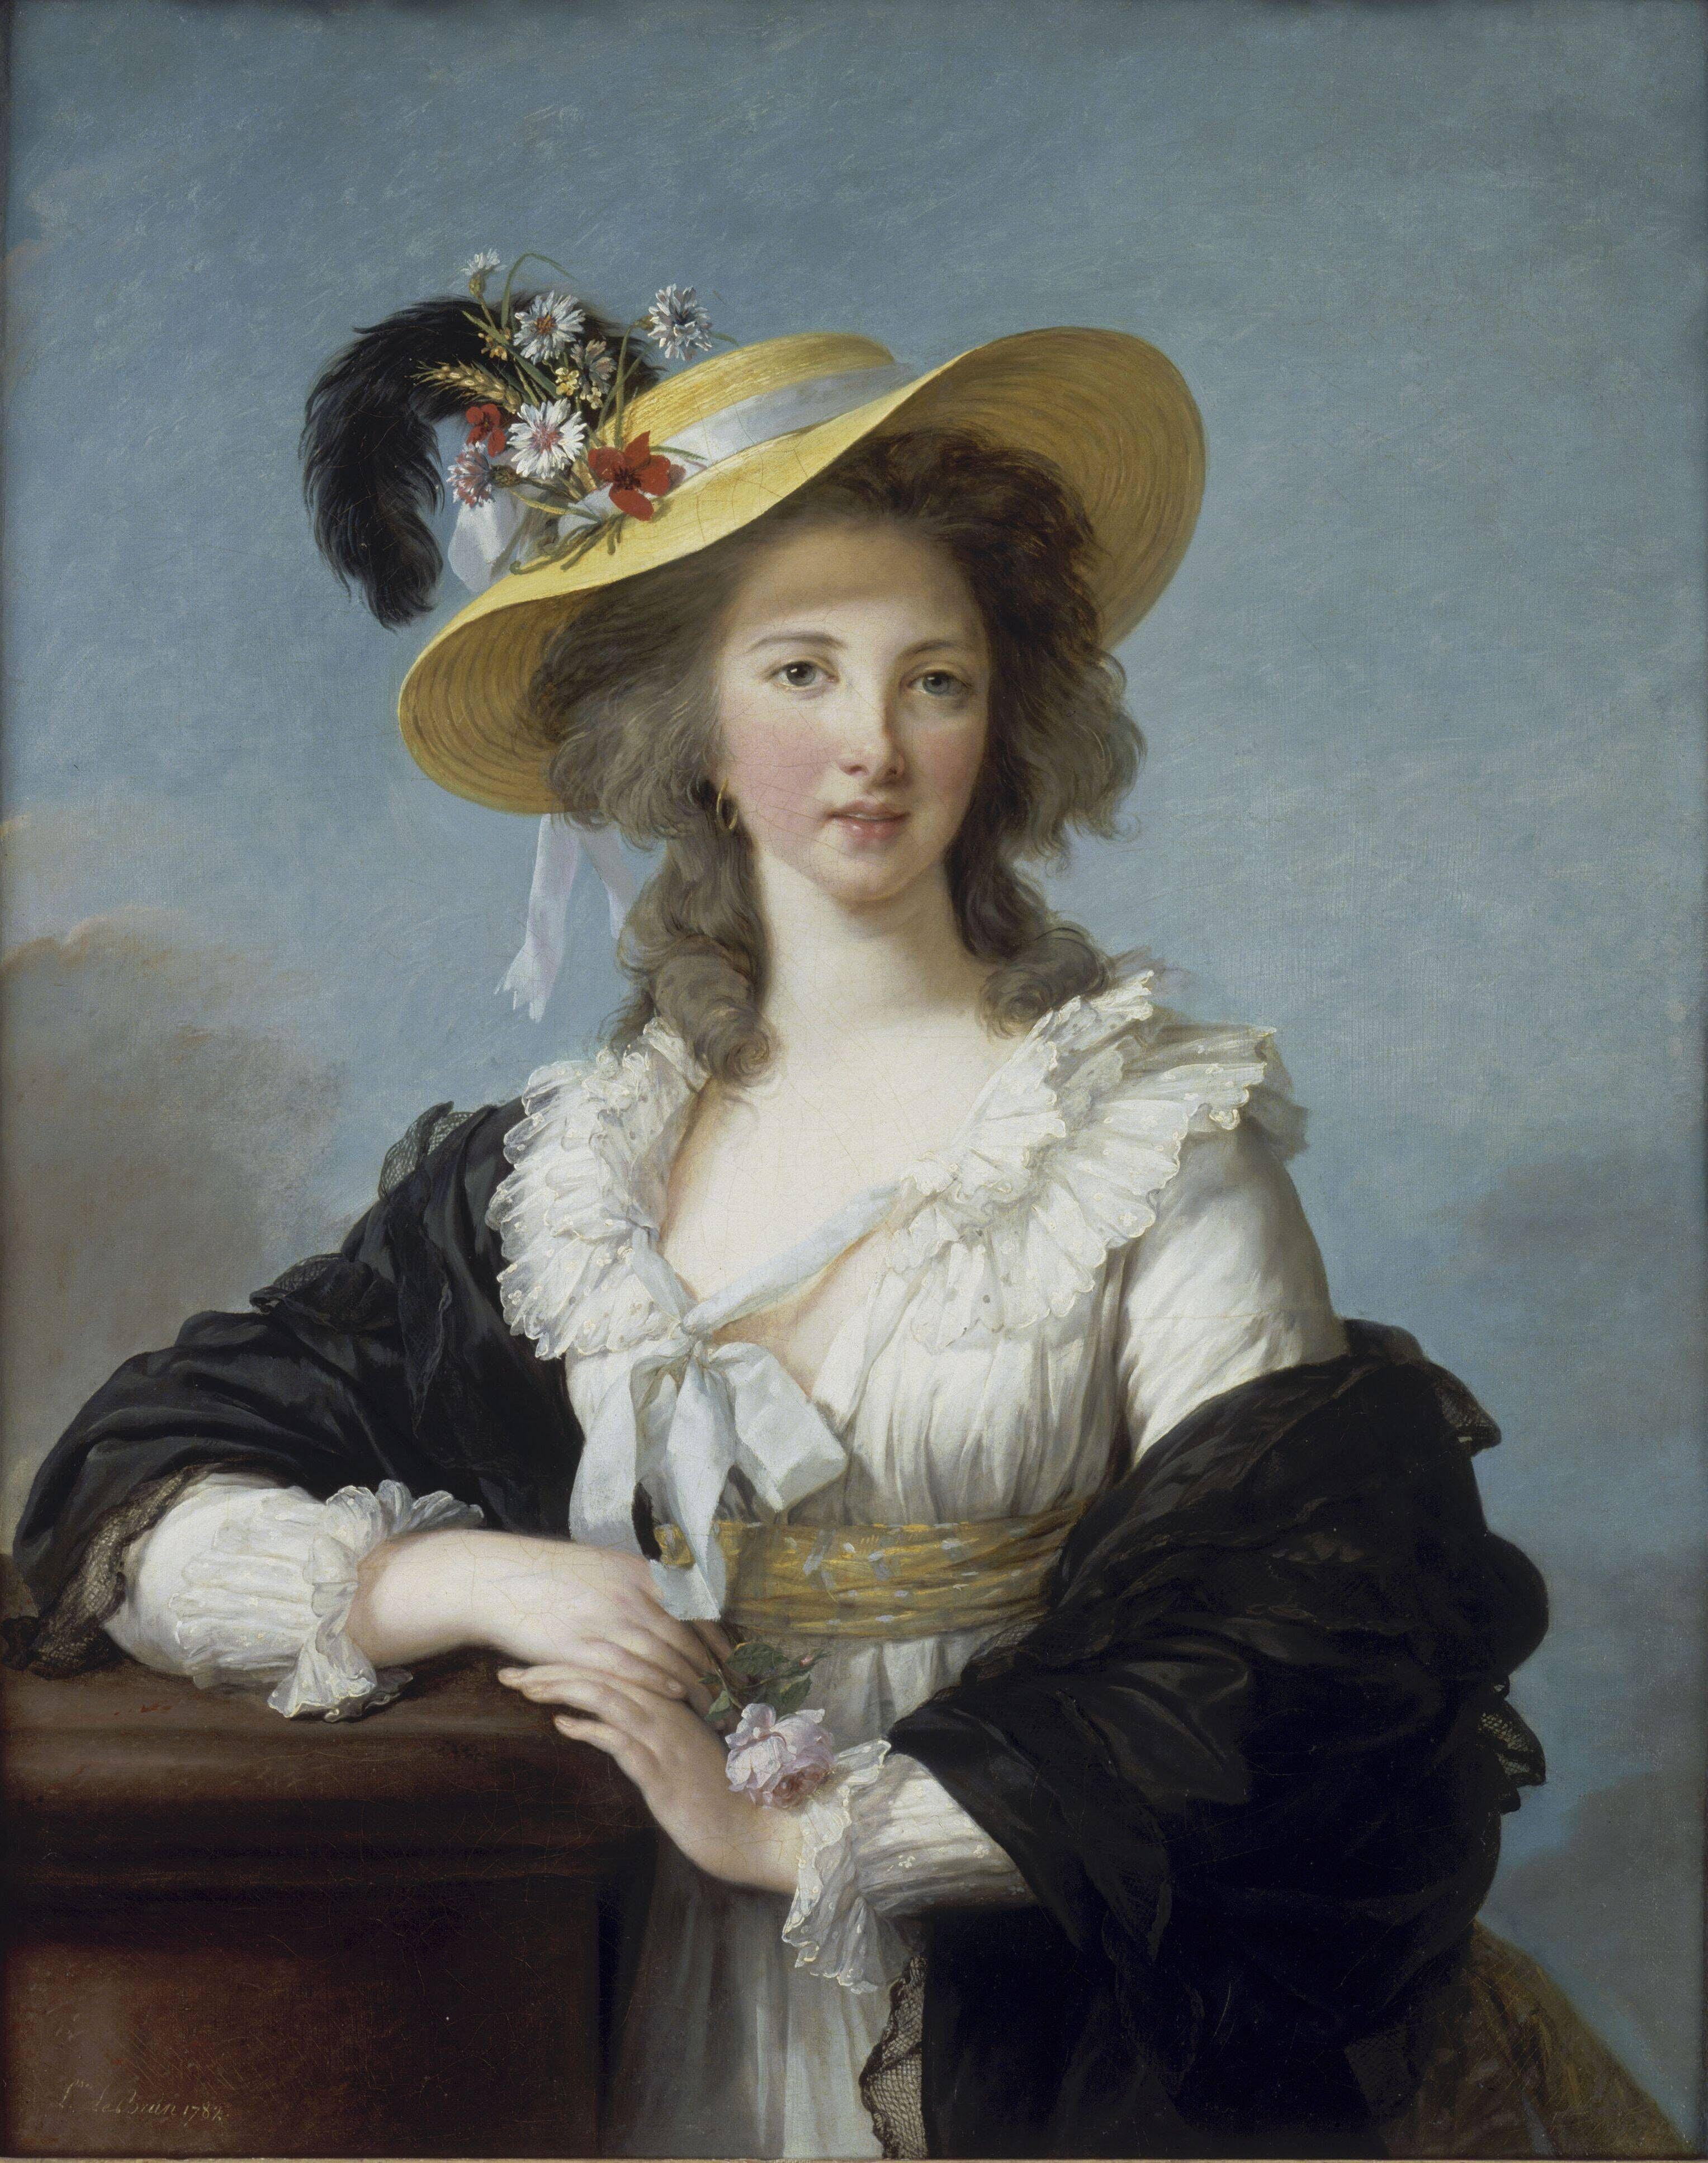 File:Duchess de Polignac.jpg